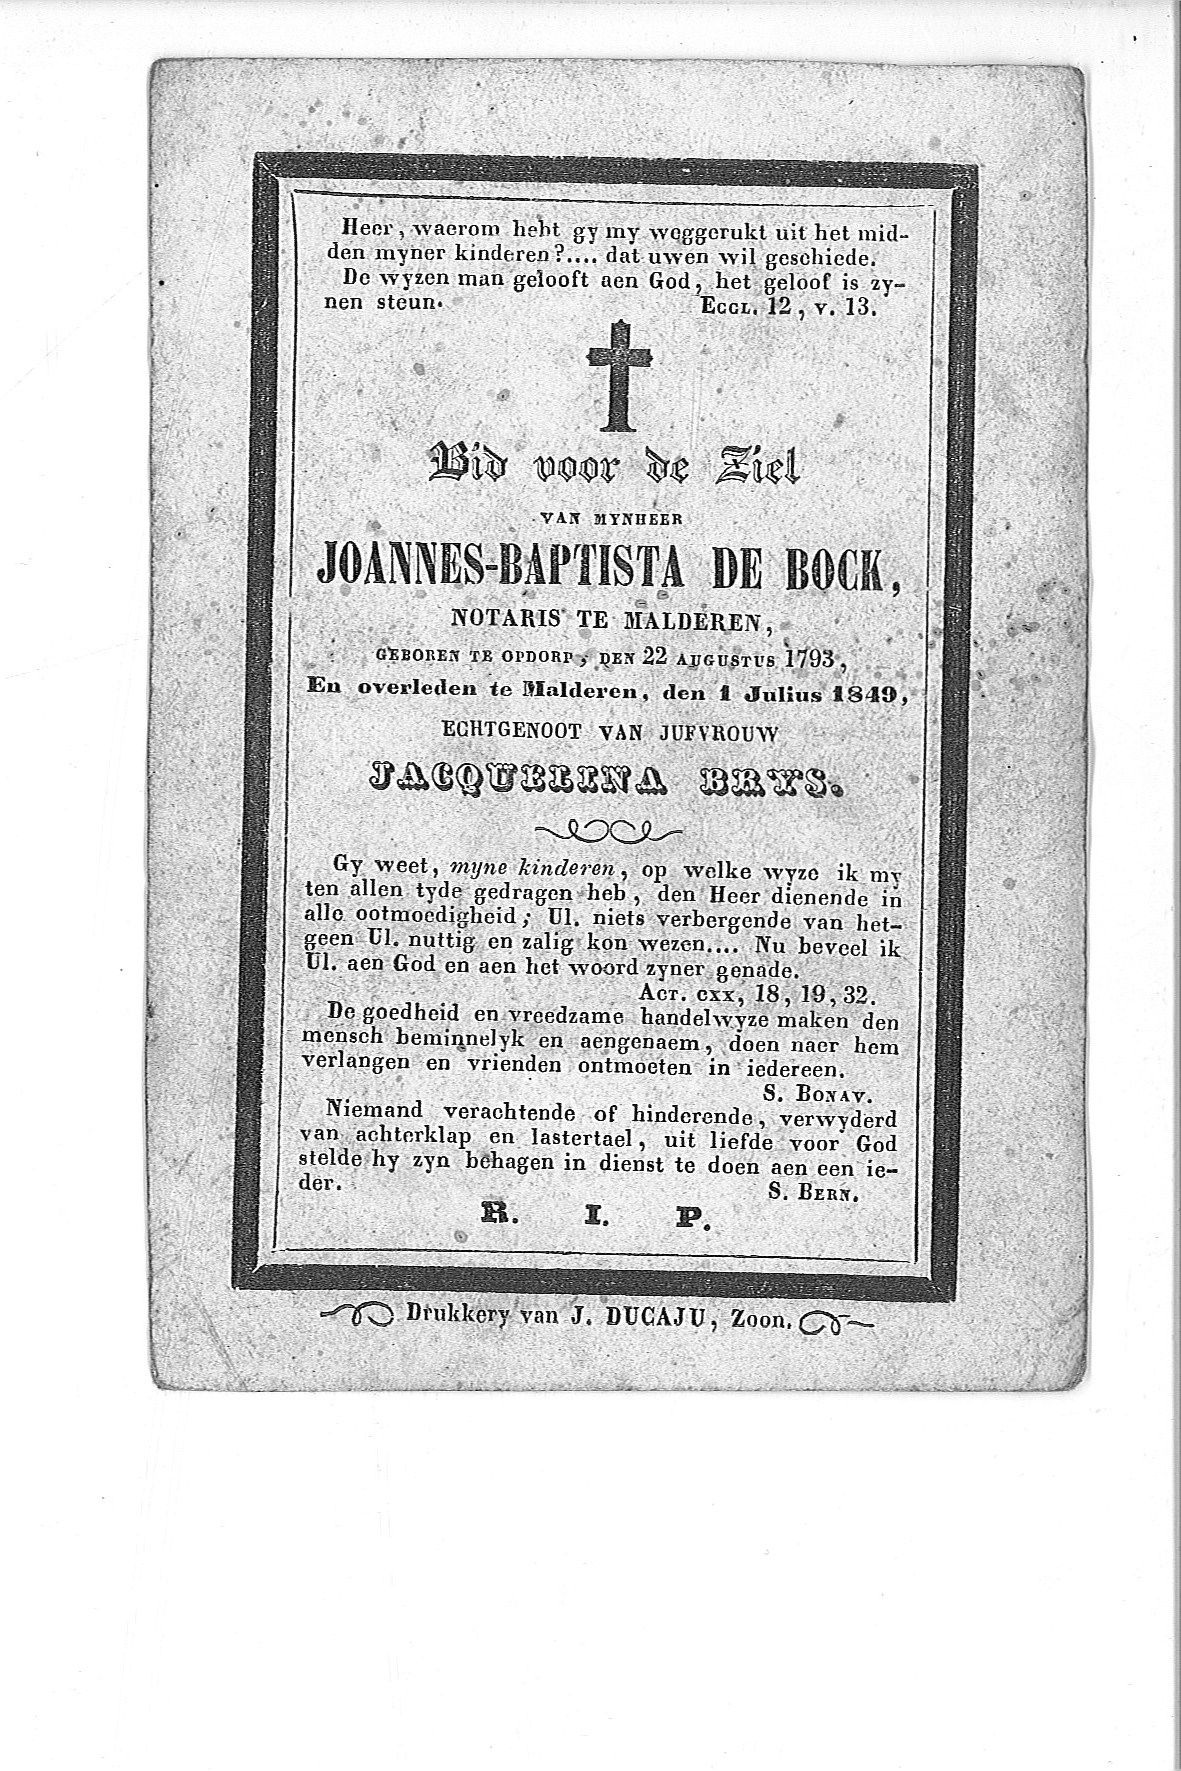 joannes-baptista-(1849)20090330085831_00026.jpg